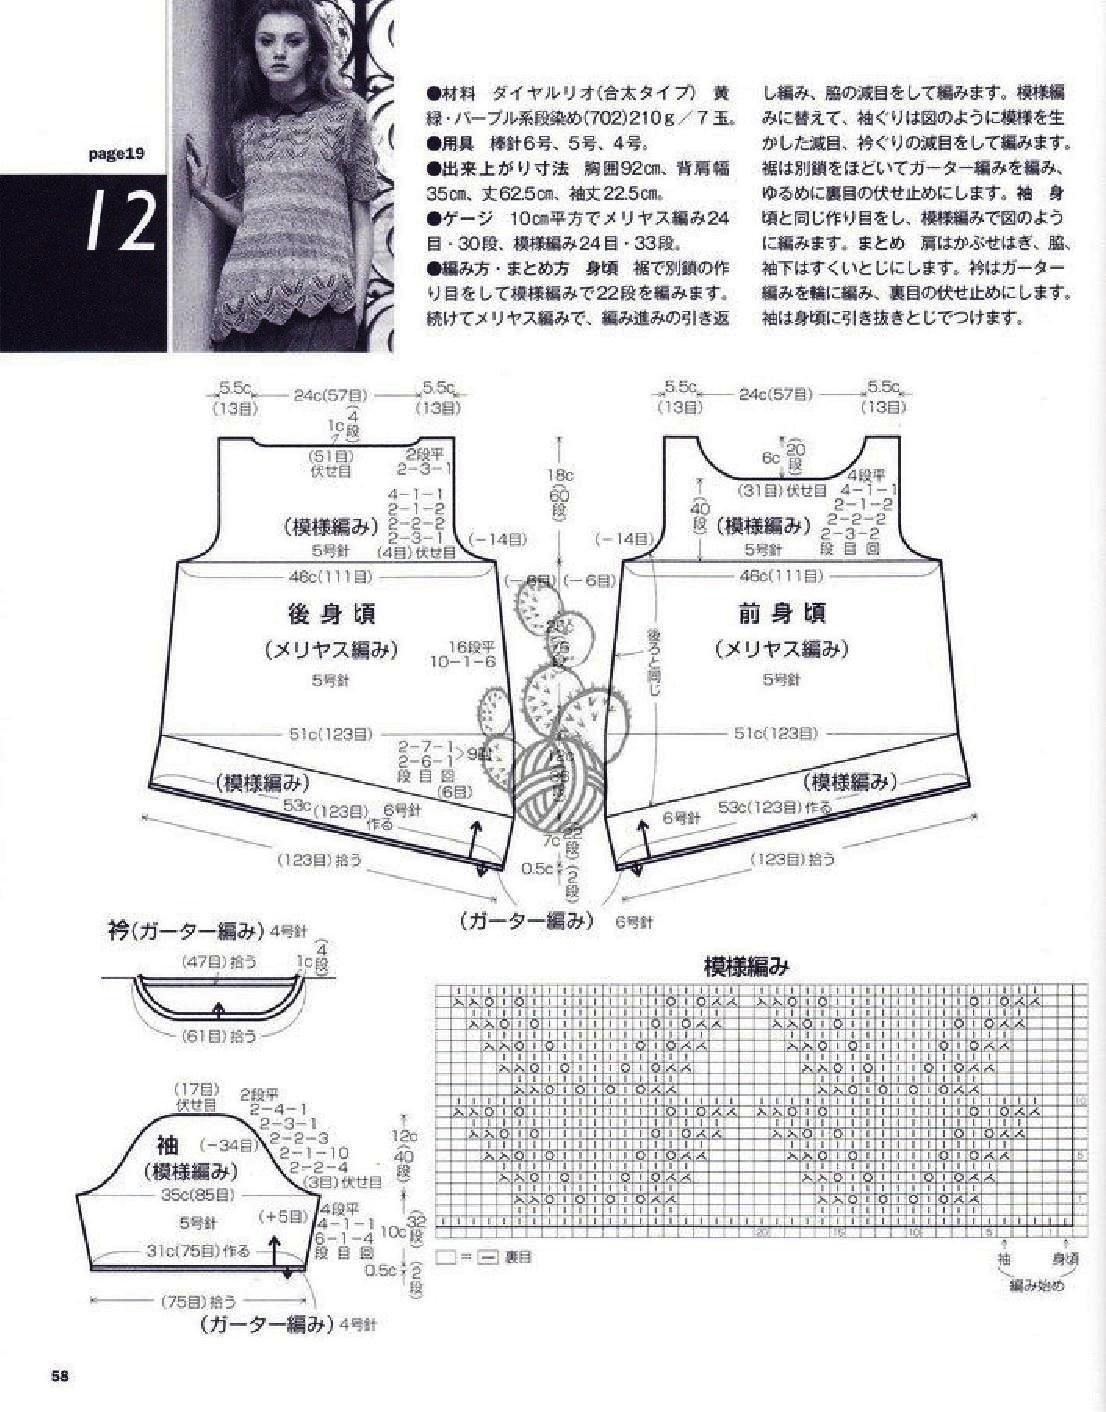 NV80258_page58_image1.jpg